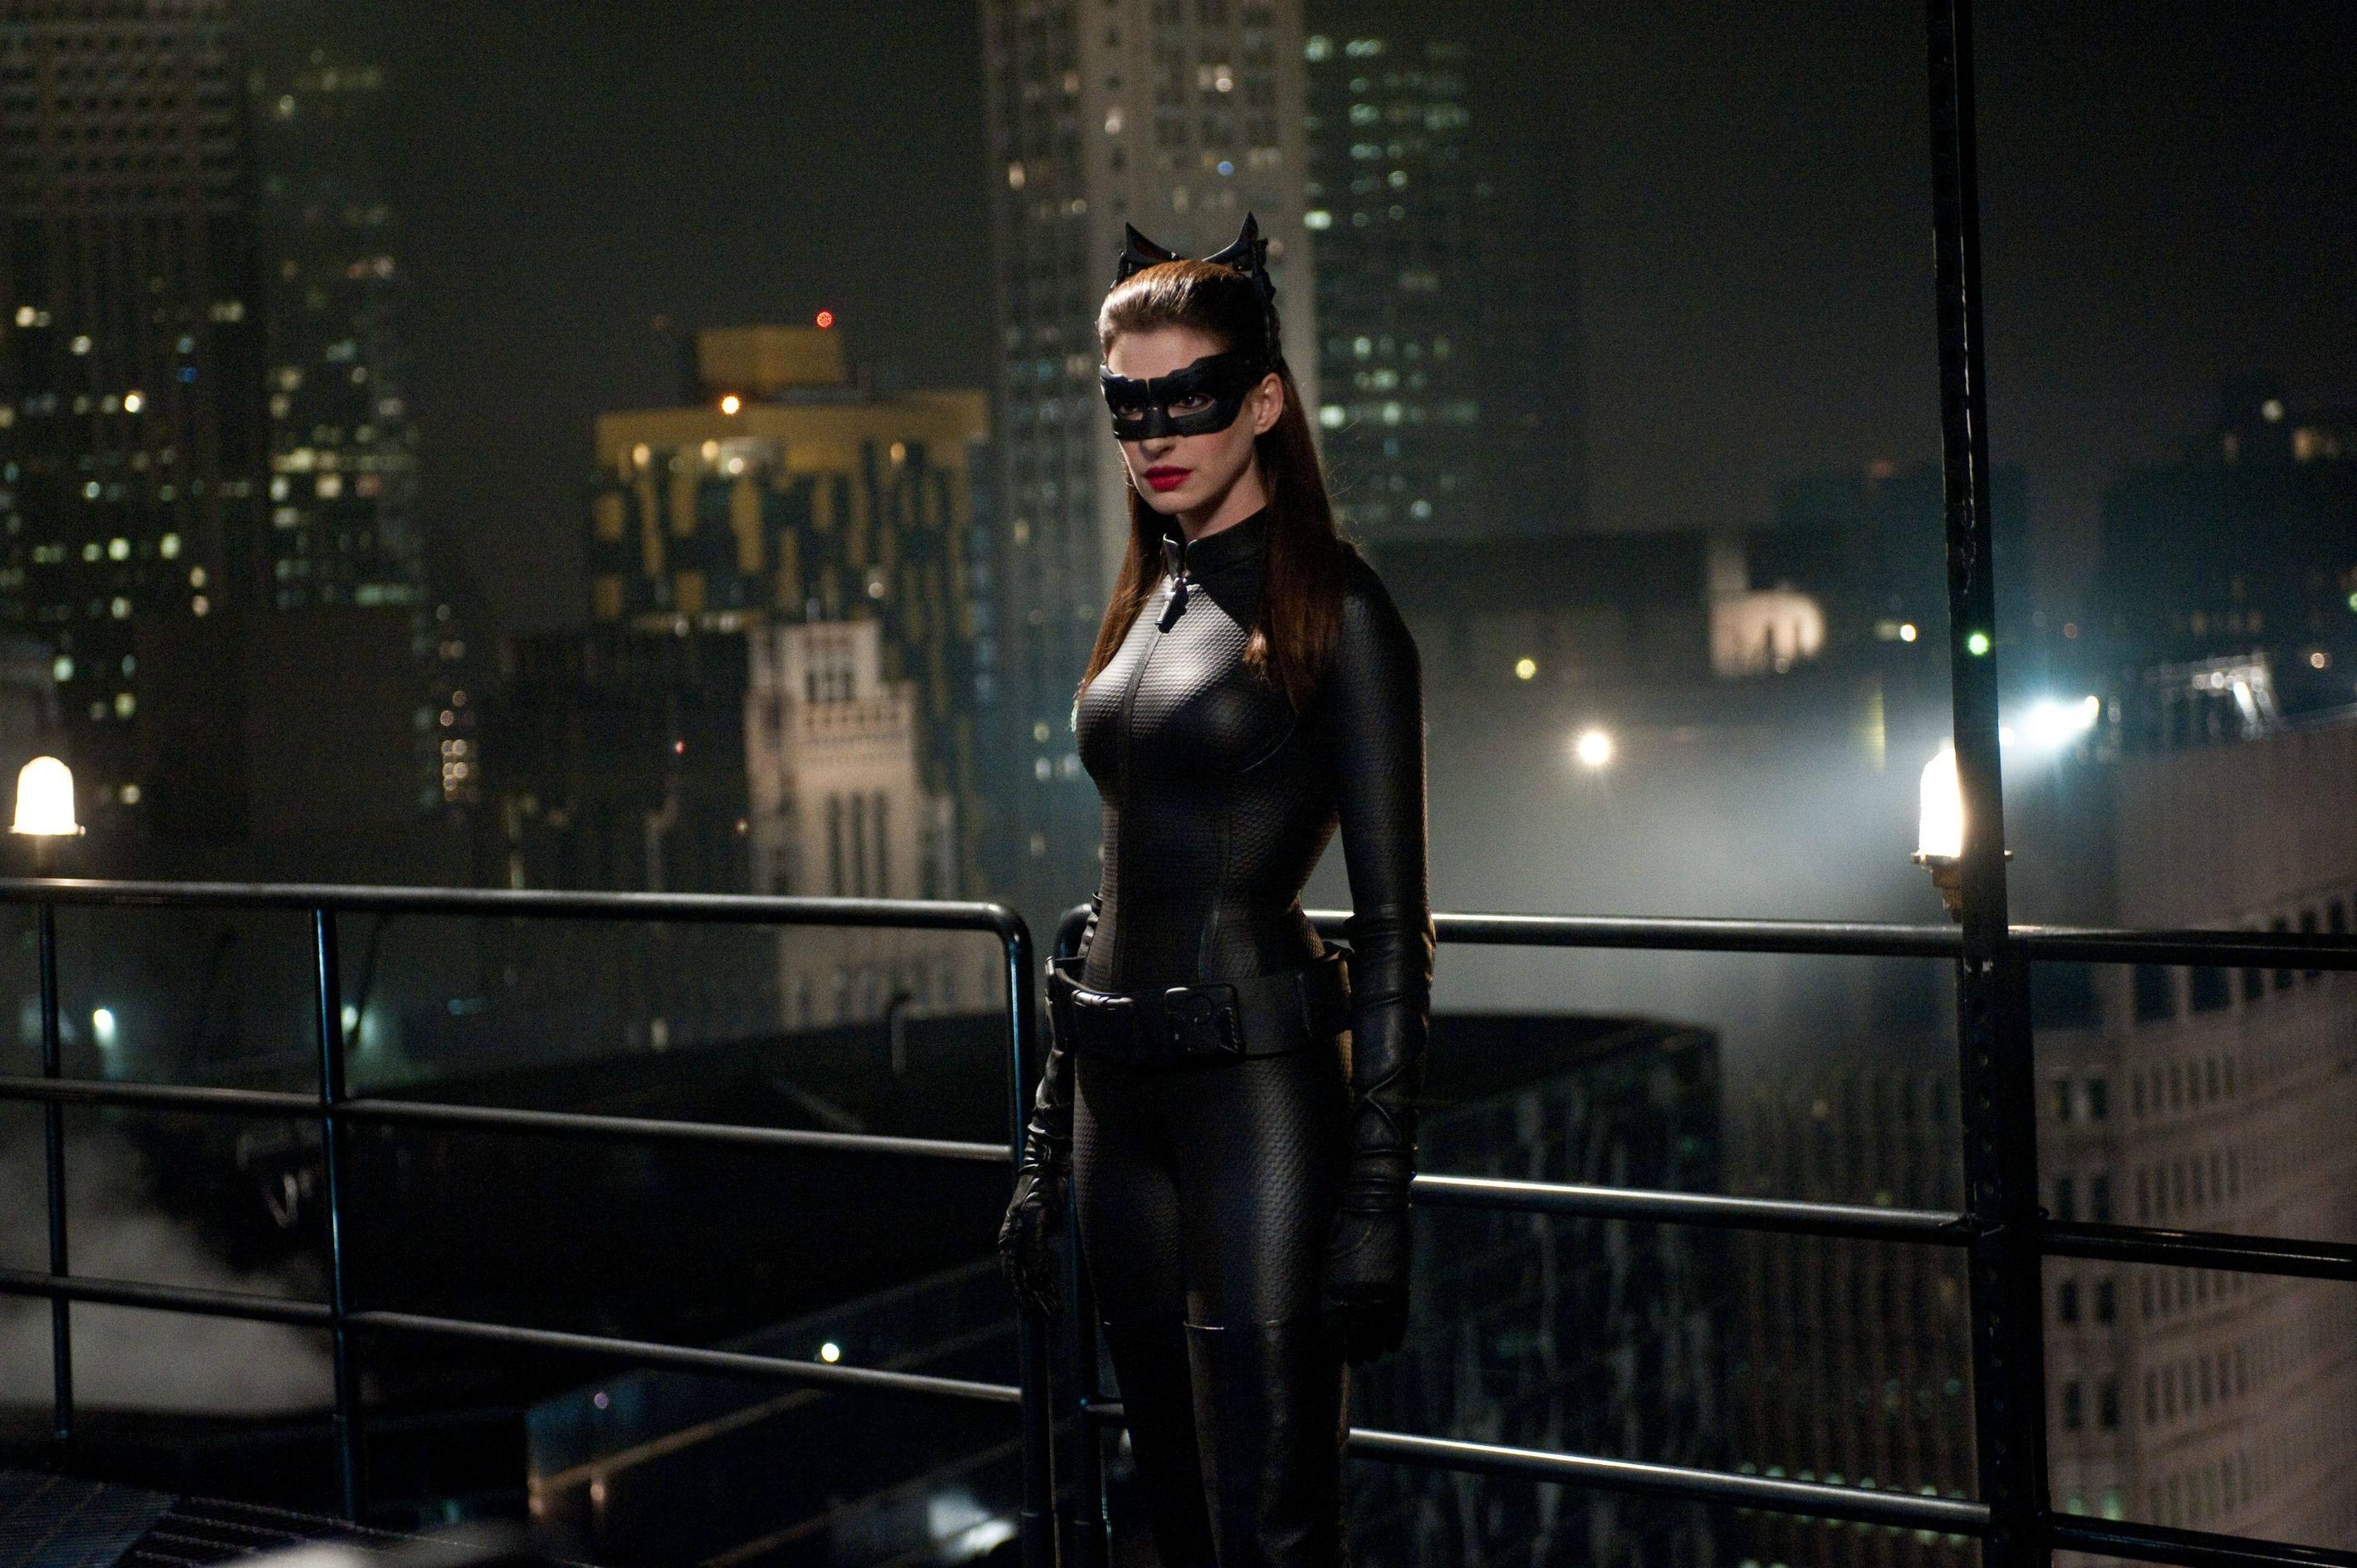 「catwoman dark knight rises」の画像検索結果